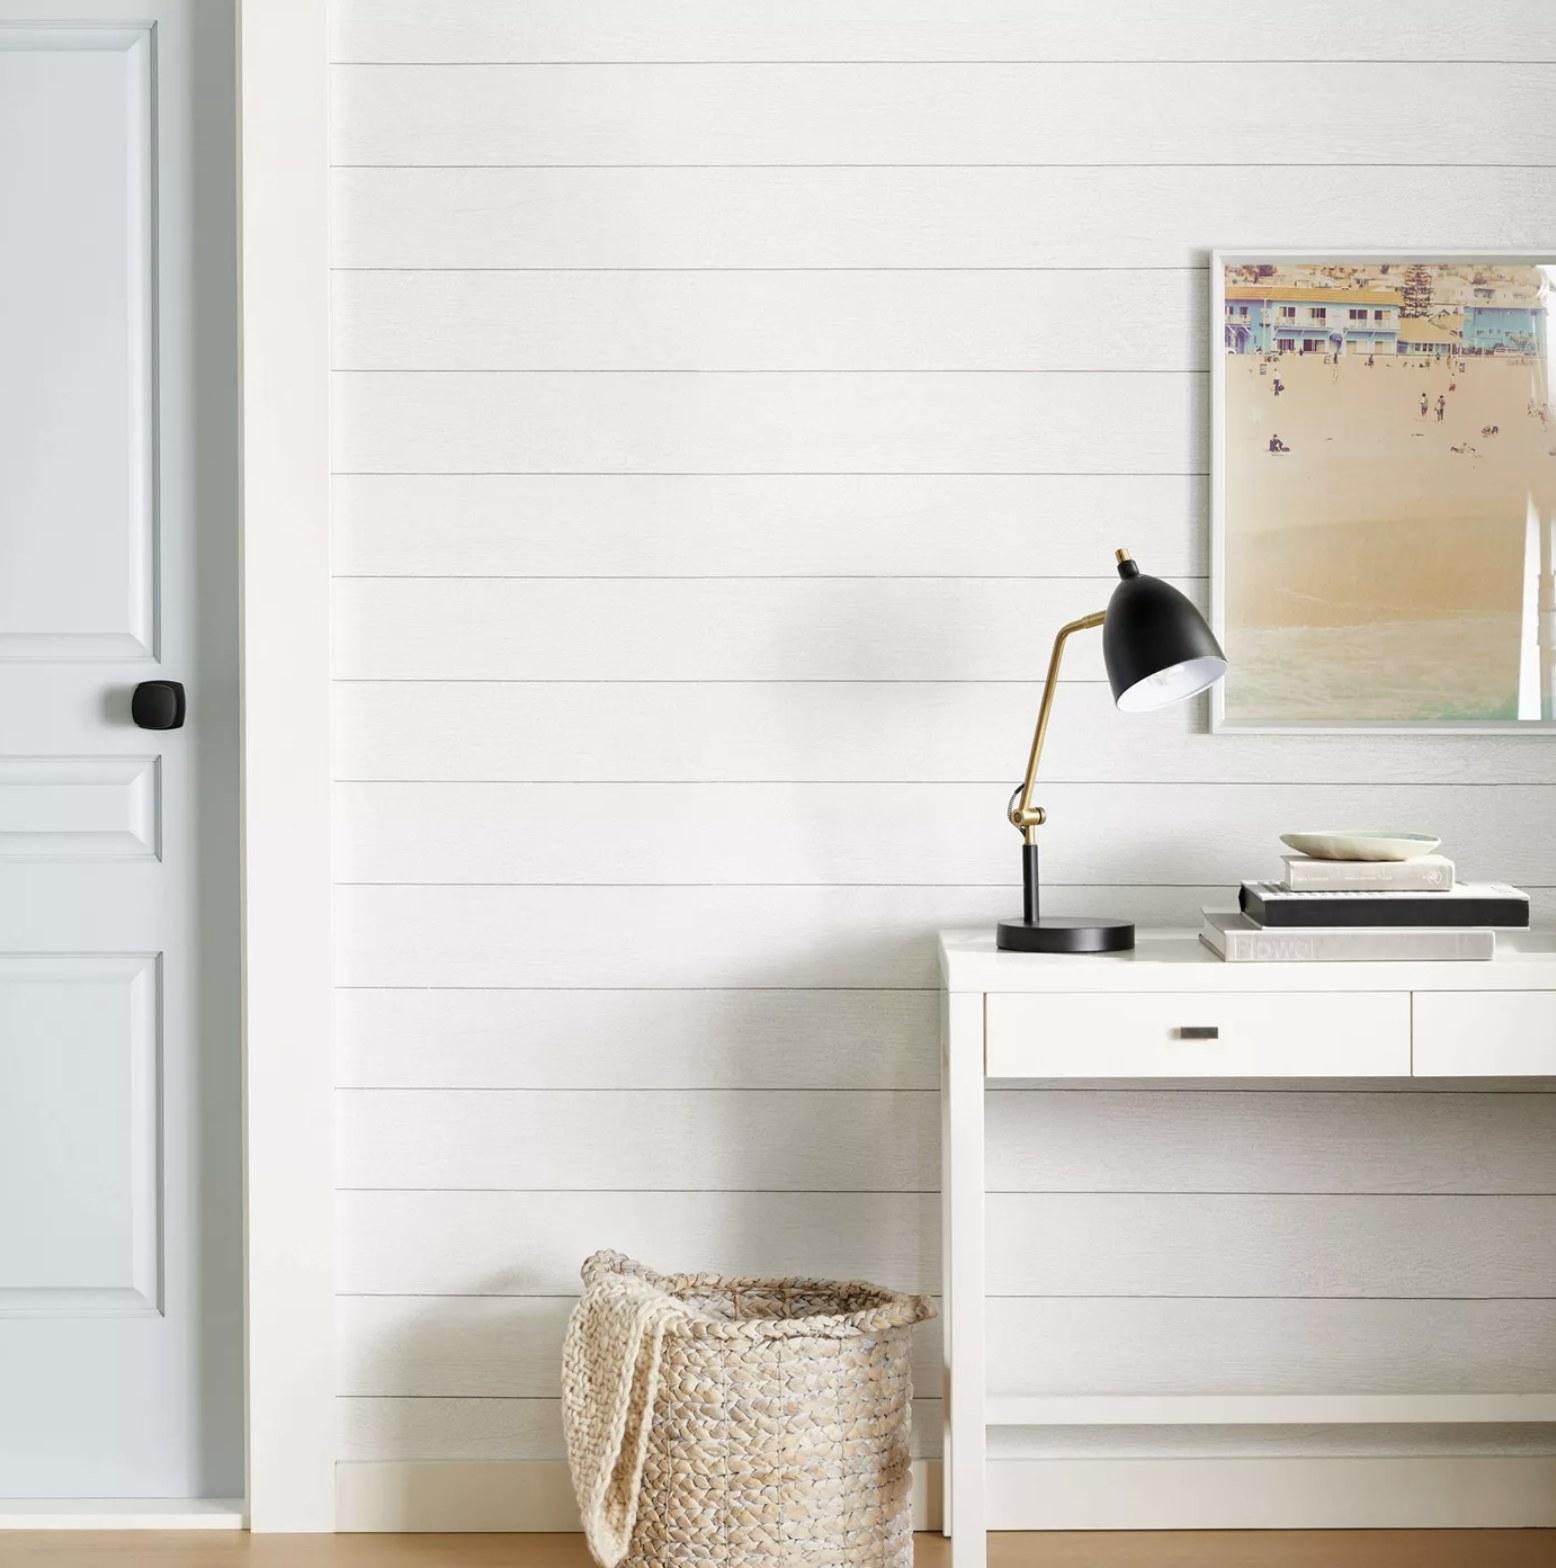 Wallpaper that looks like white paneling